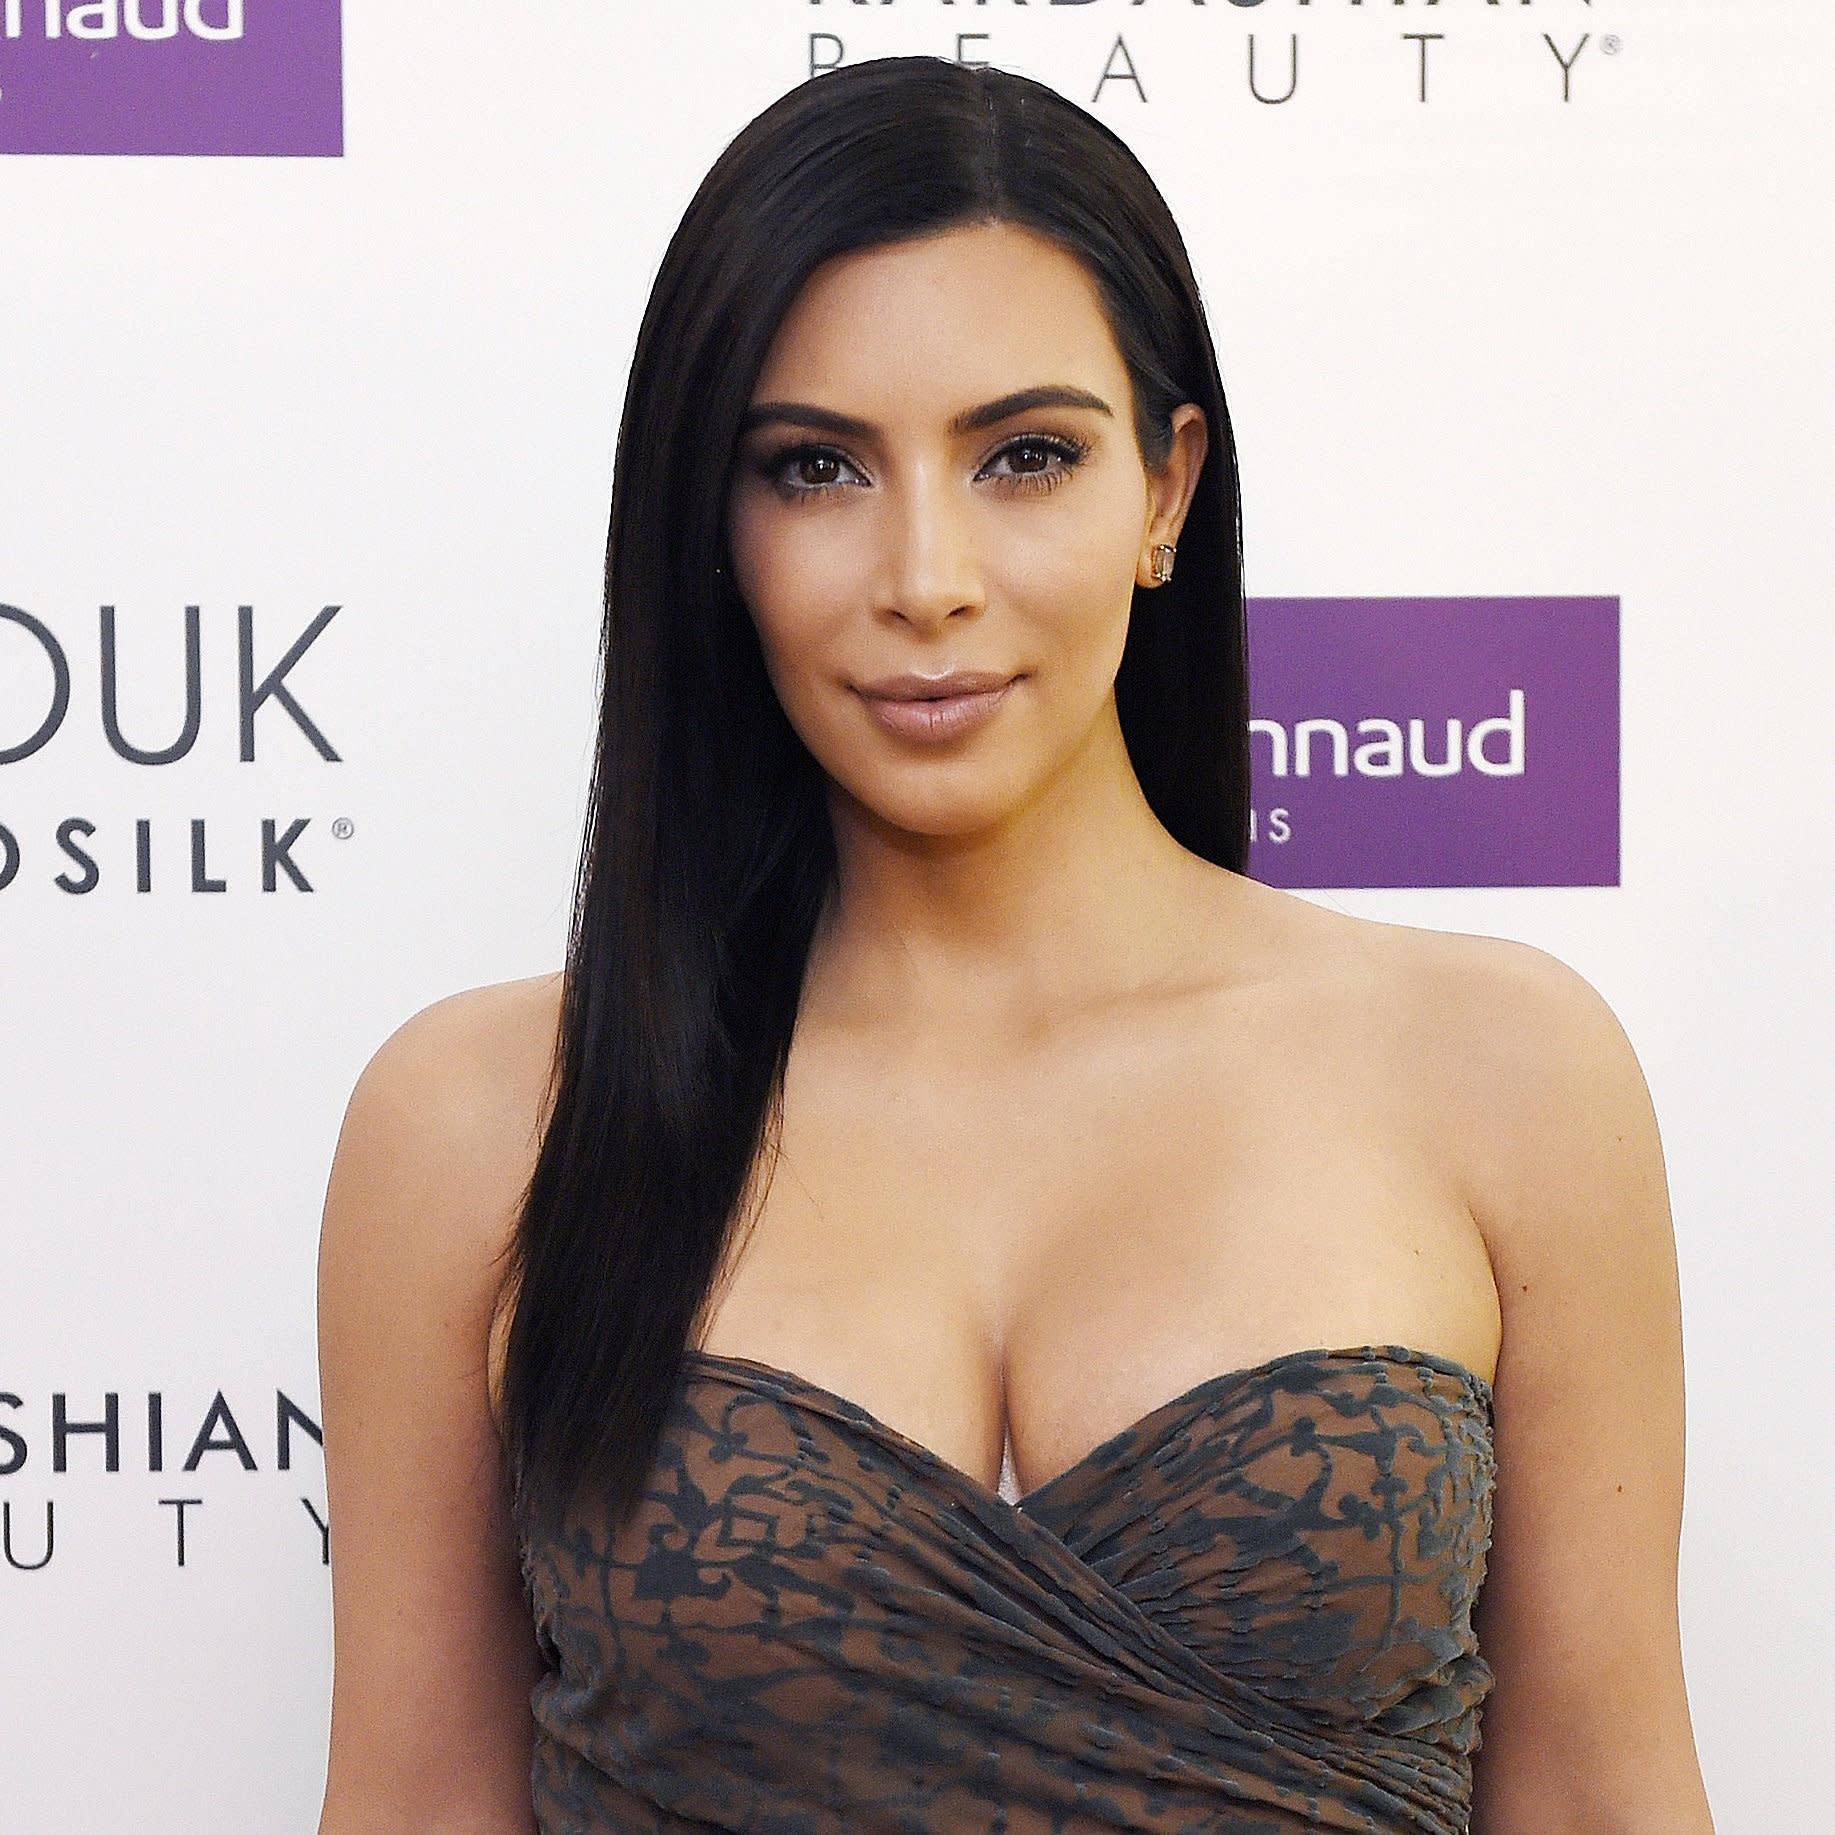 The Pregnancy Risk That Has Kim Kardashian Considering a Surrogate